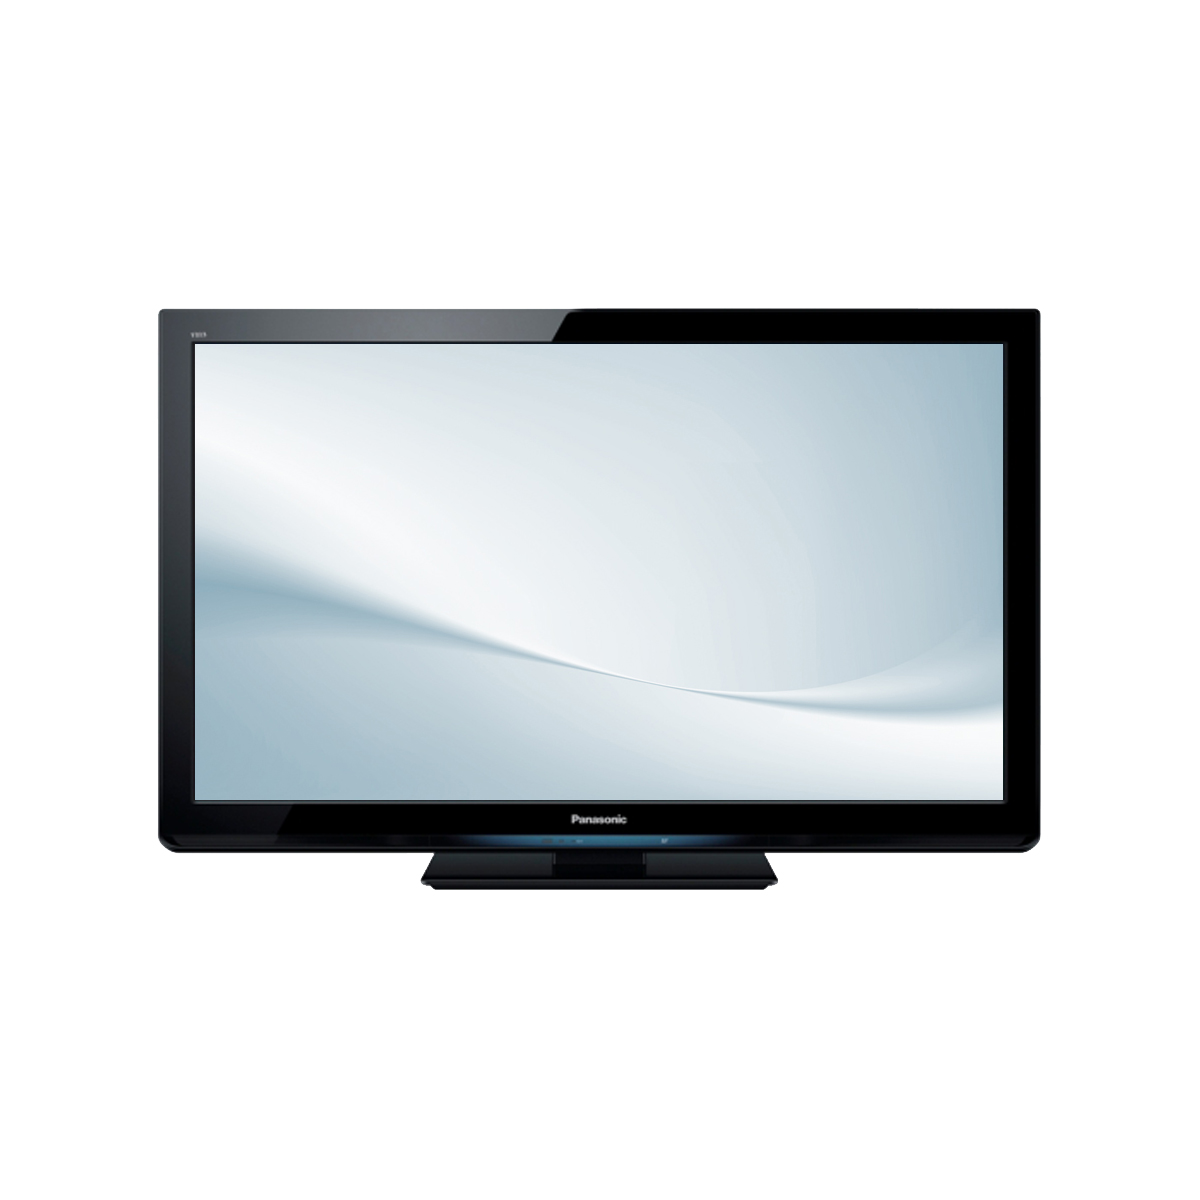 Panasonic Txl42u3b Lcd Tv Review Compare Prices Buy Online